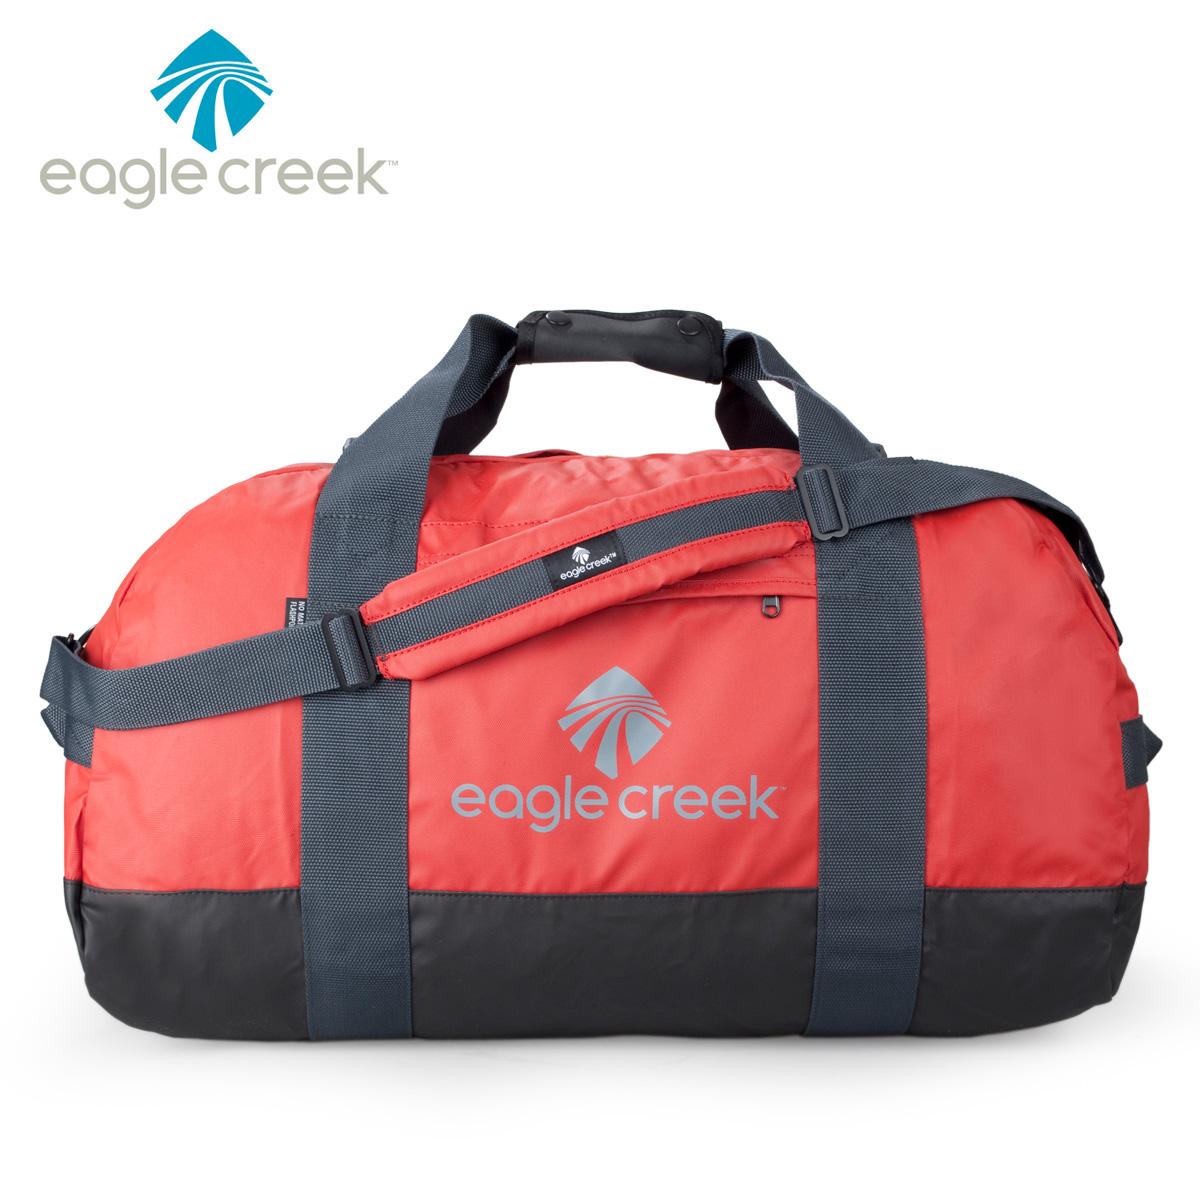 ECB20418006 防水手提折叠旅行包袋单肩斜挎包 Creek Eagle 正品美国